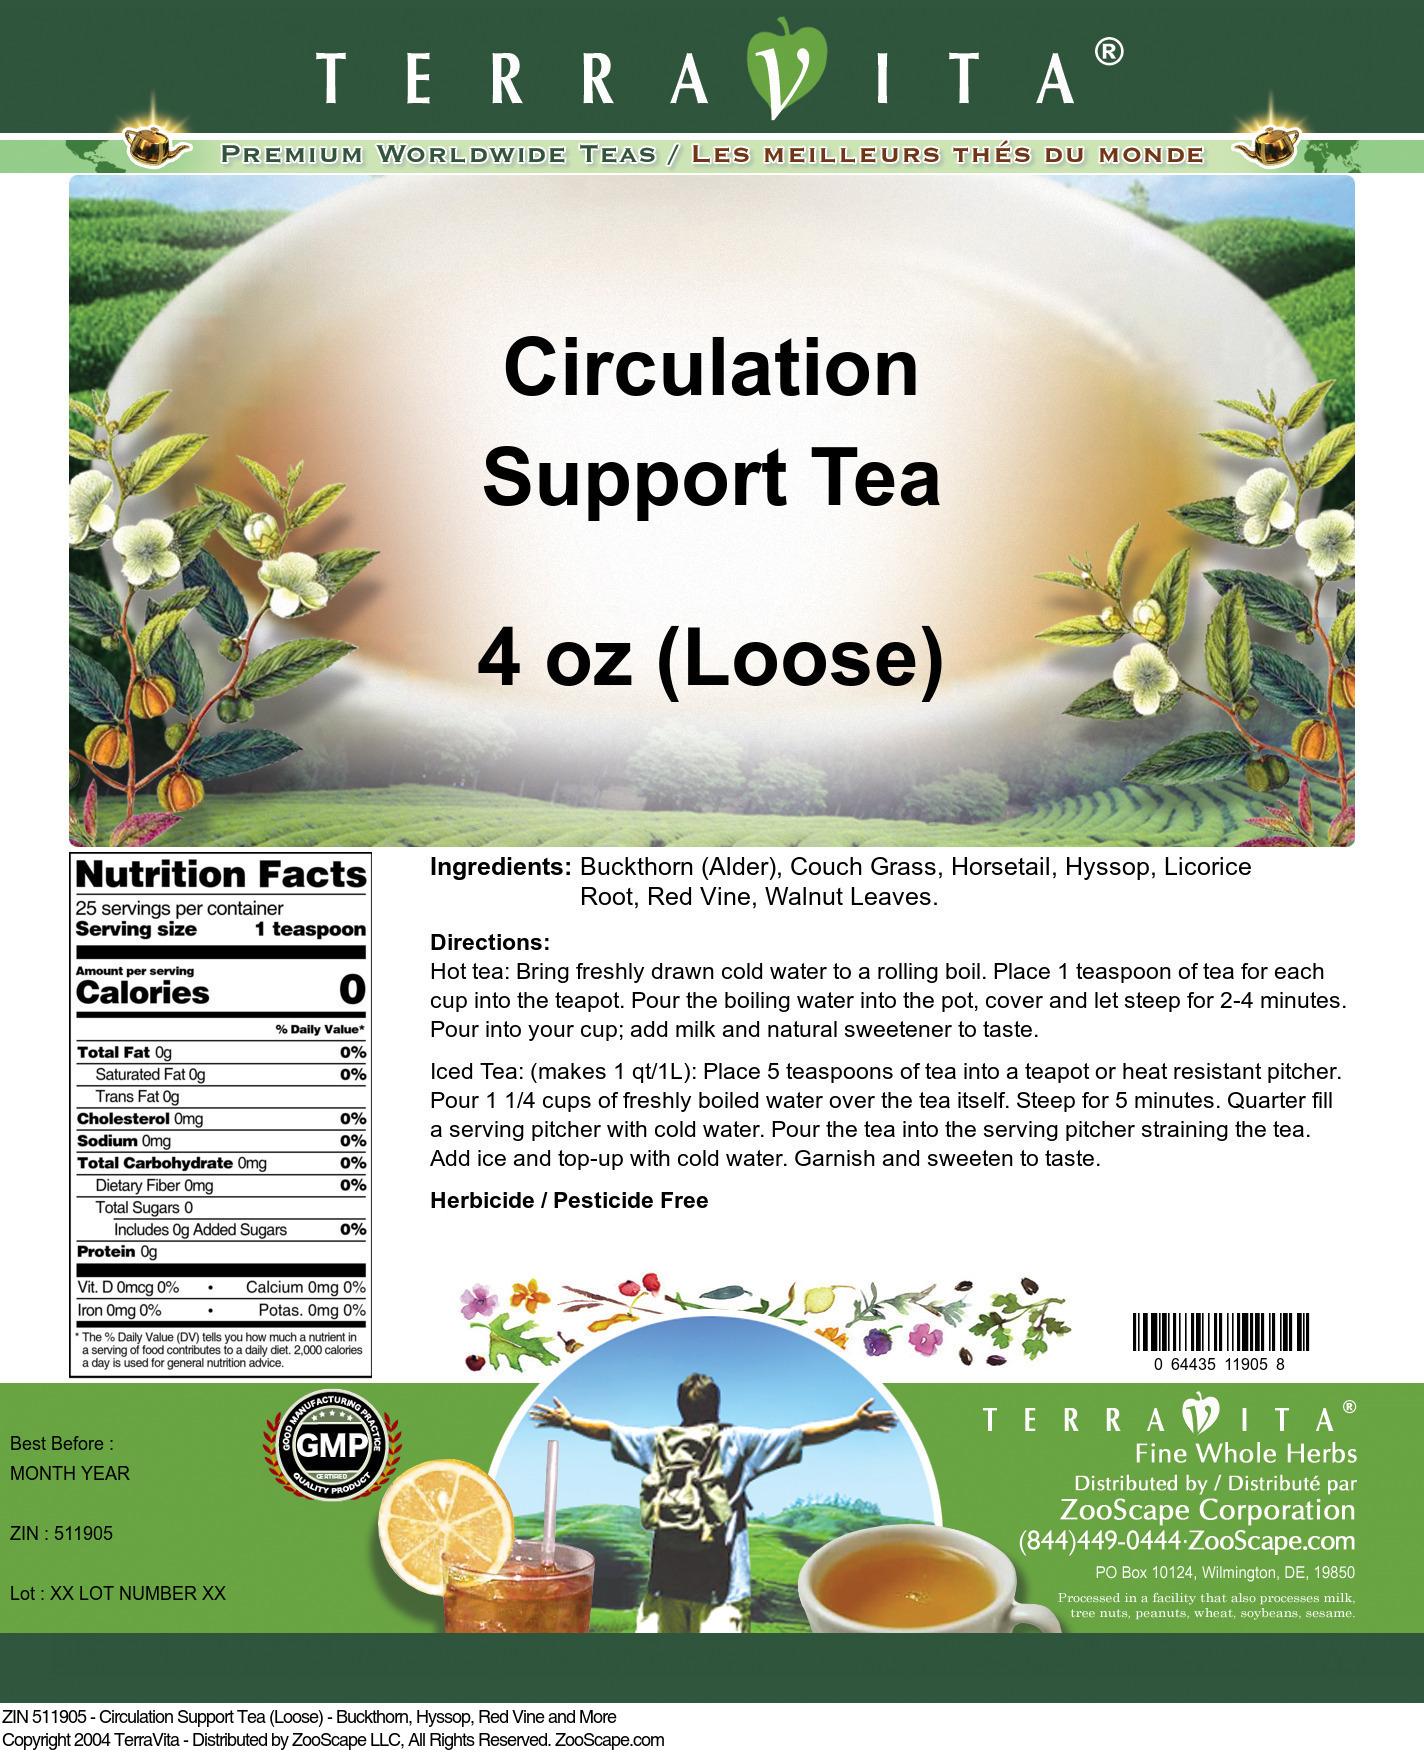 Circulation Support